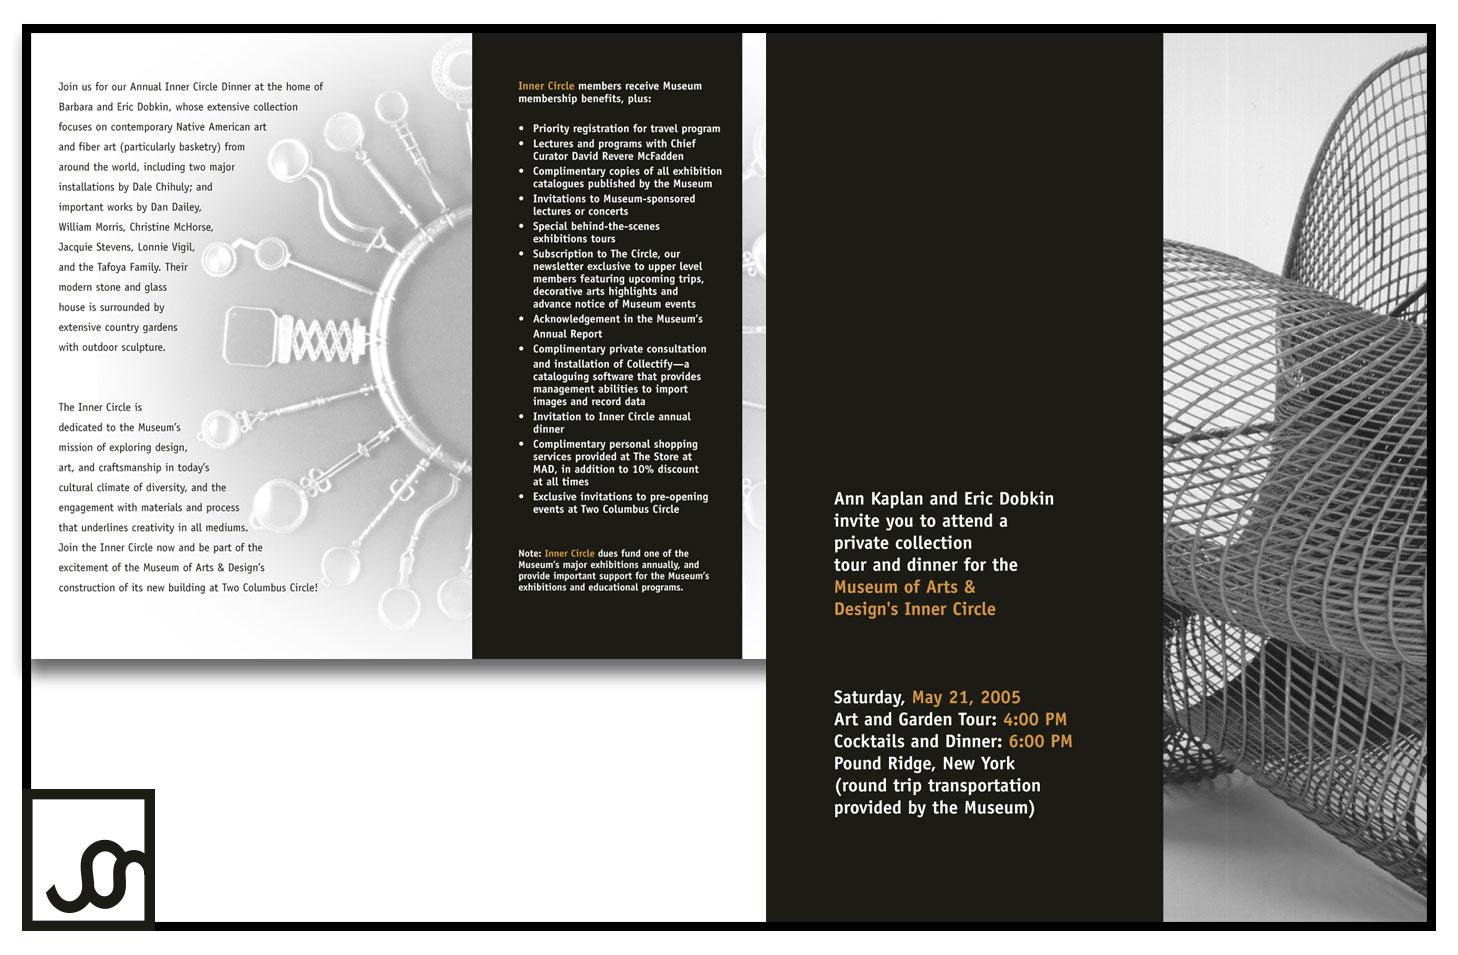 Museum of Arts and Design Invitation